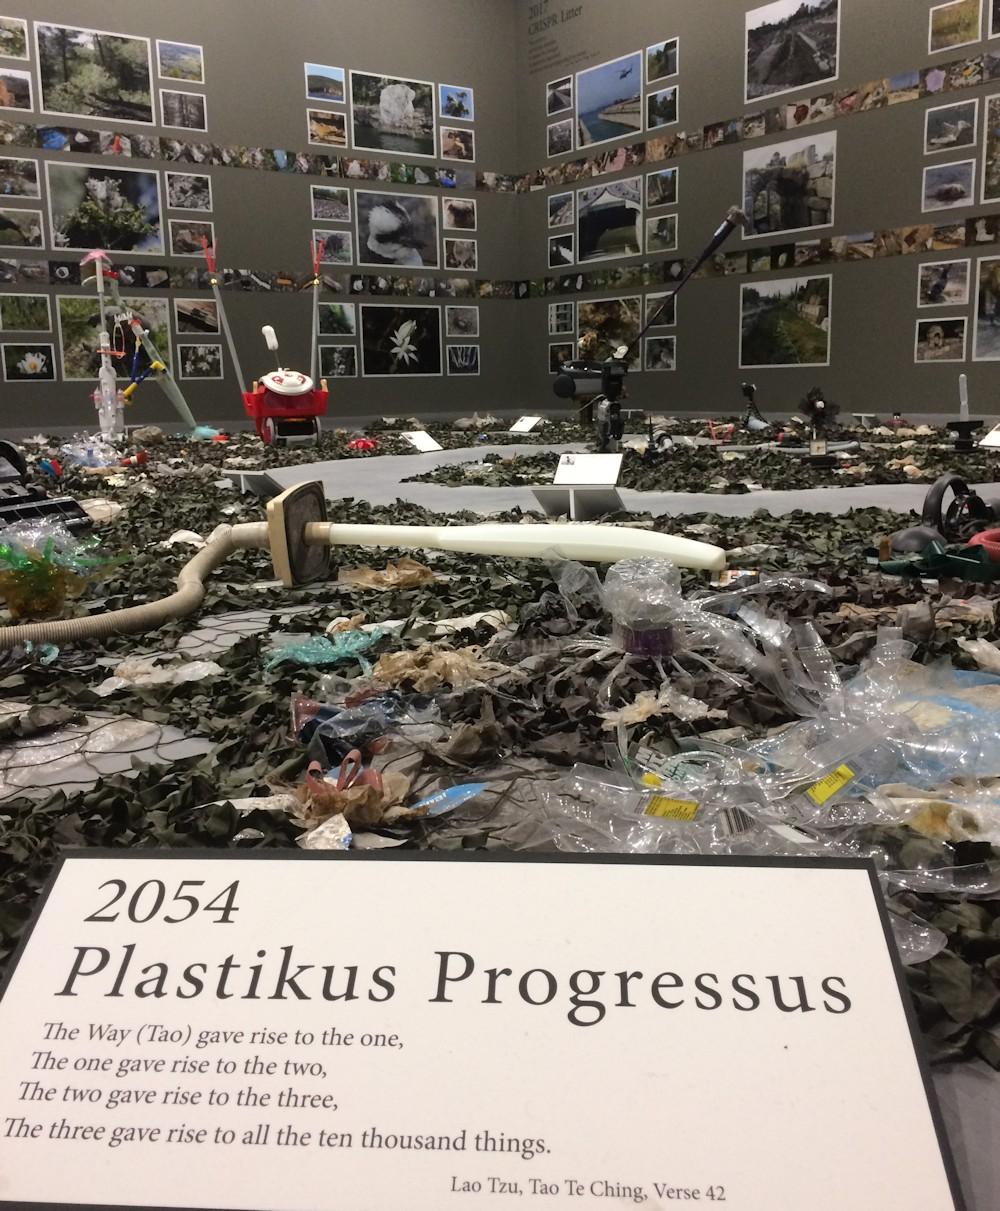 Bonita Ely PlastikusProgressu: Momento Mori (2017)